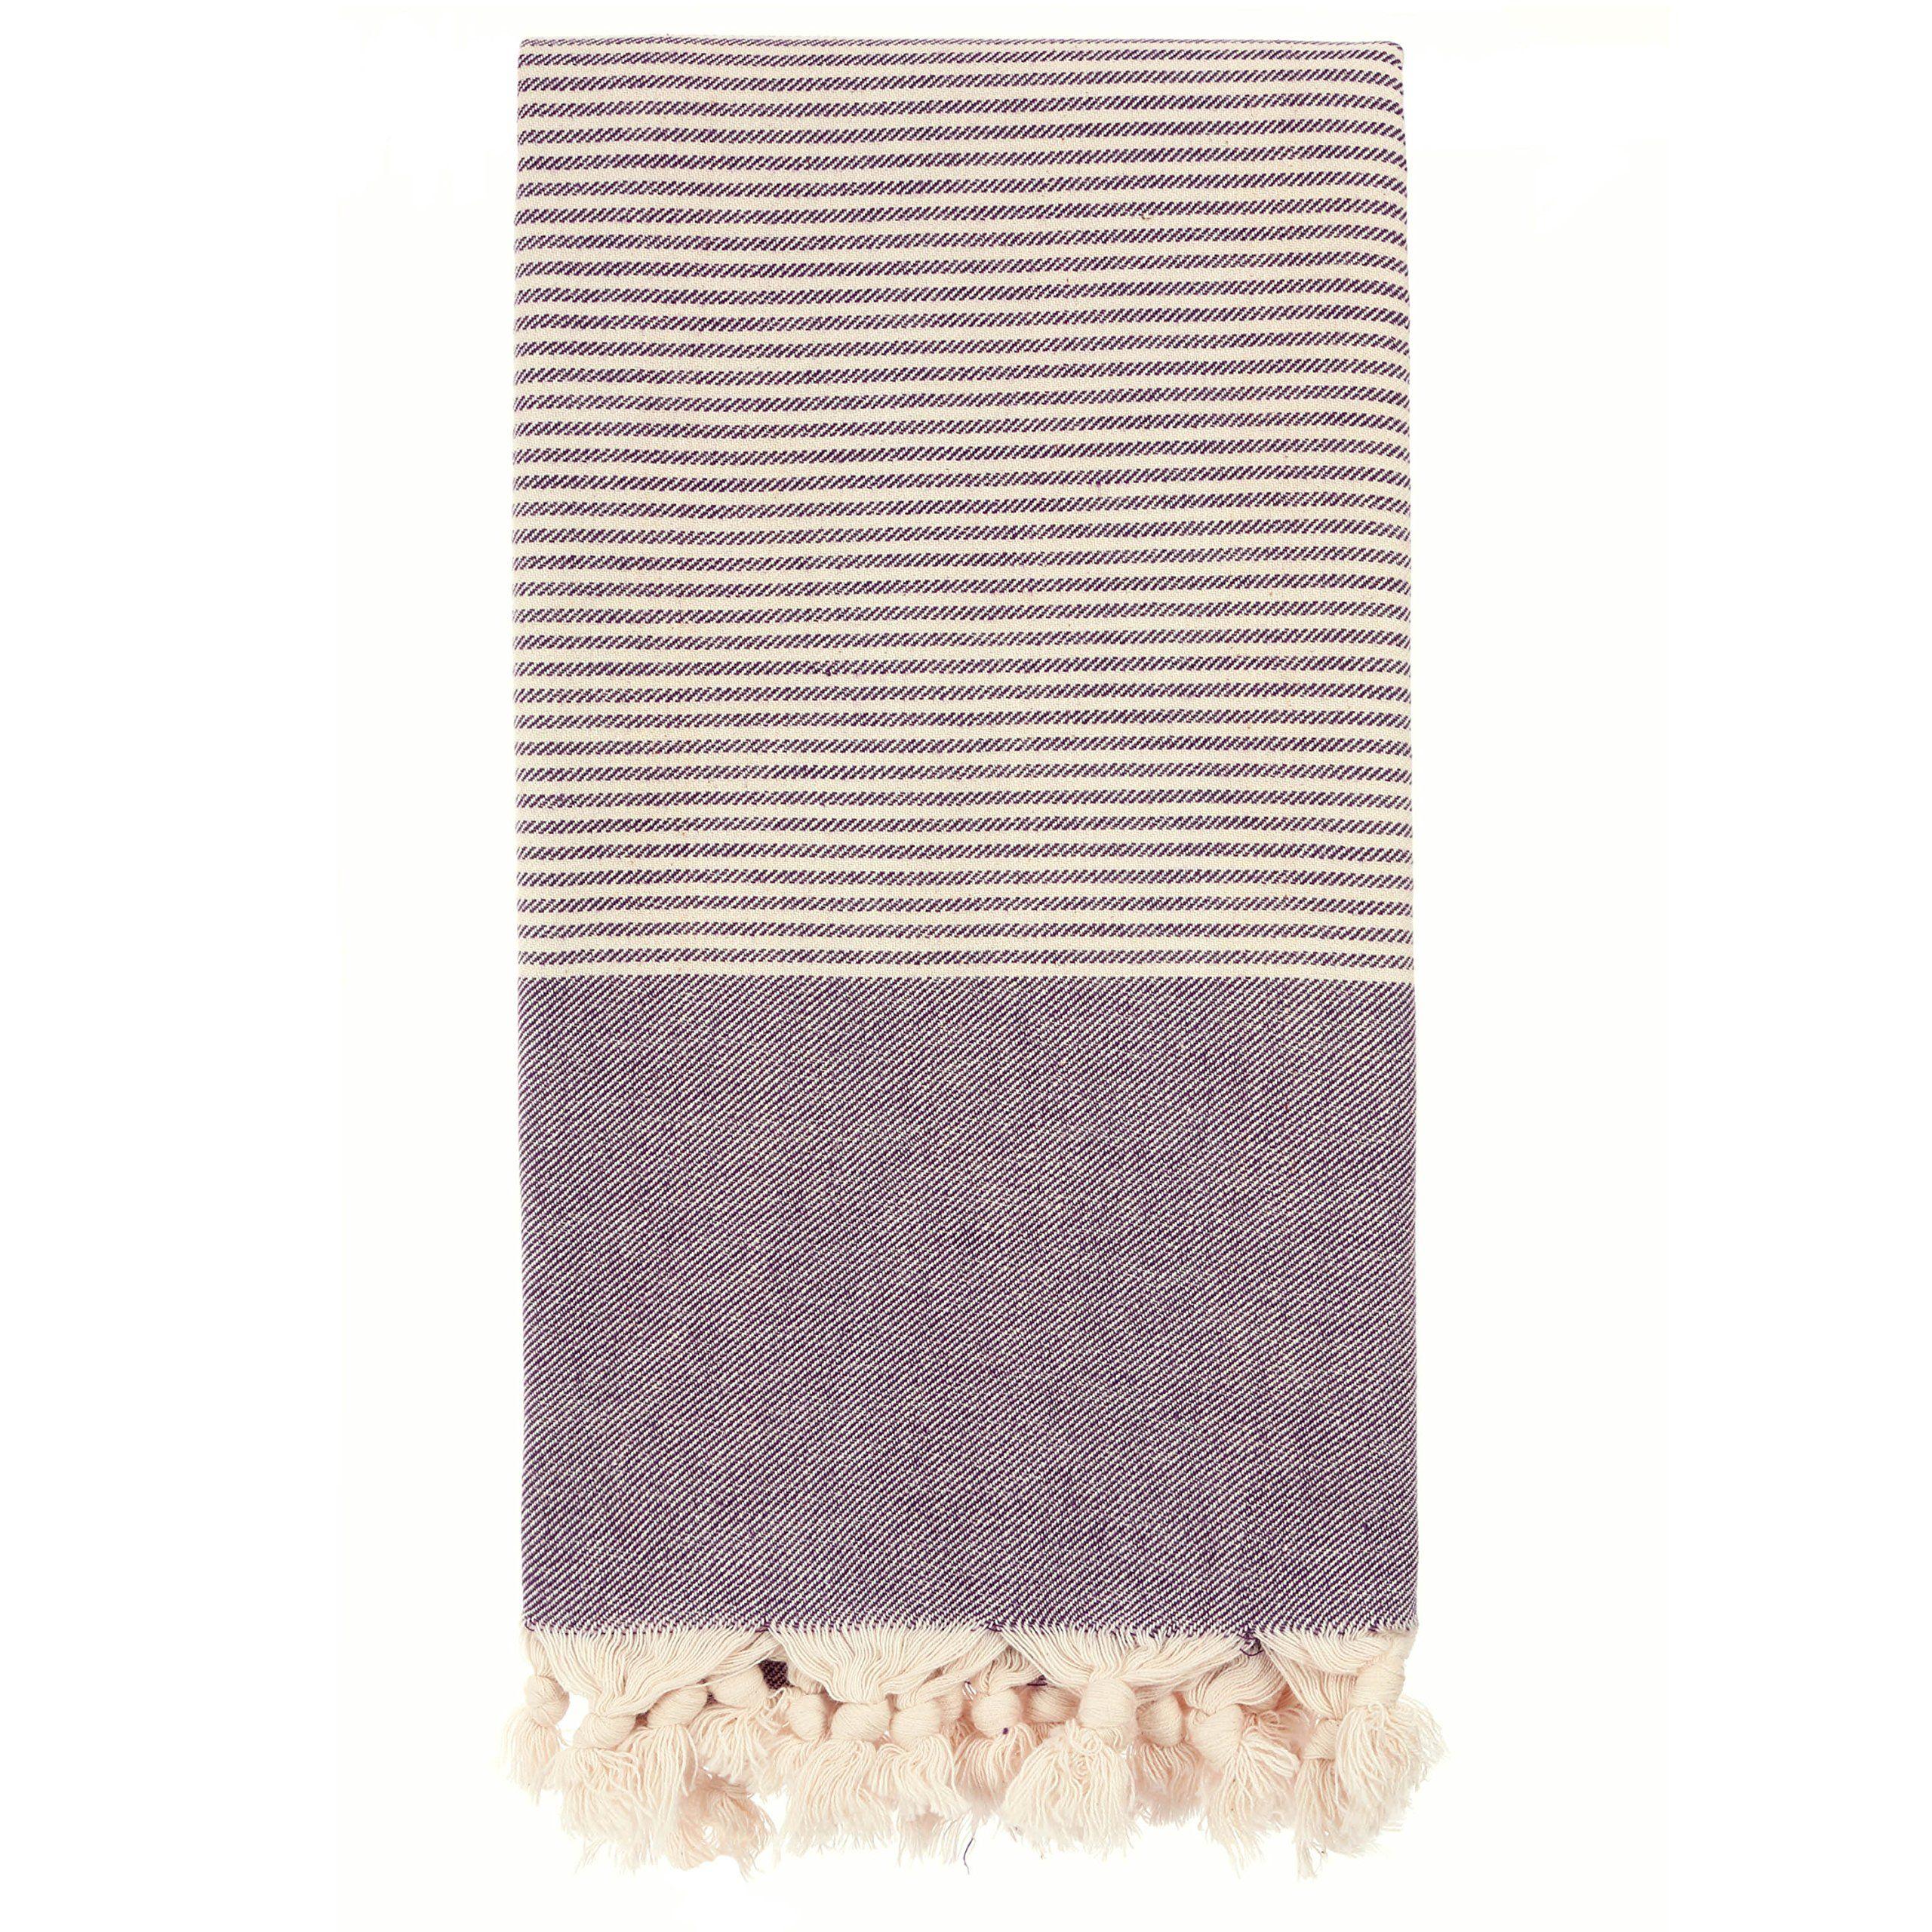 hand loomed pestemal striped turkish bath towel 34x66 100 cottontm by cacala darkpurple